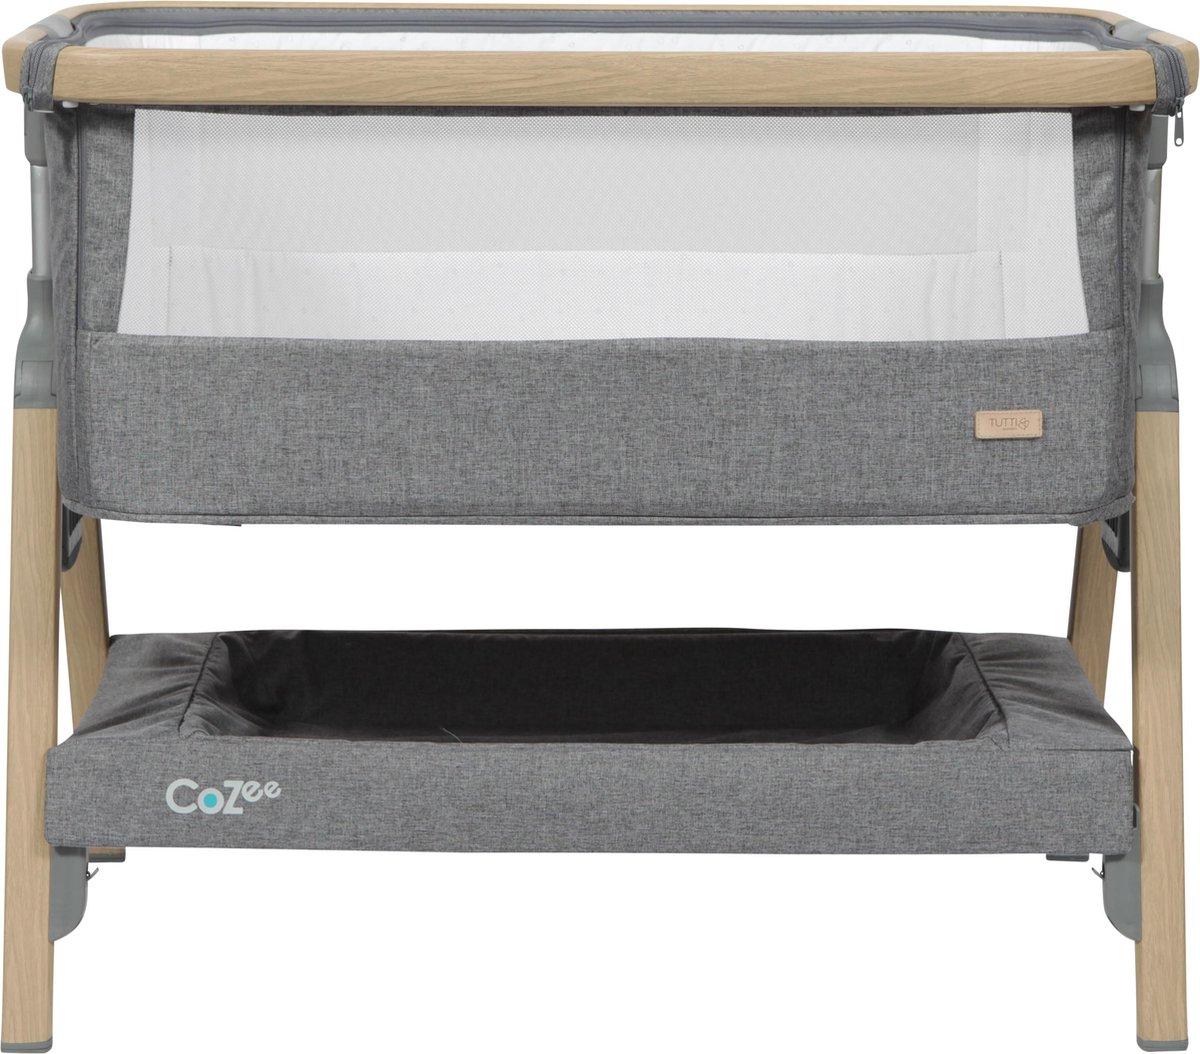 Tutti Bambini Cozee Bedside Wieg - Oak/Charcoal